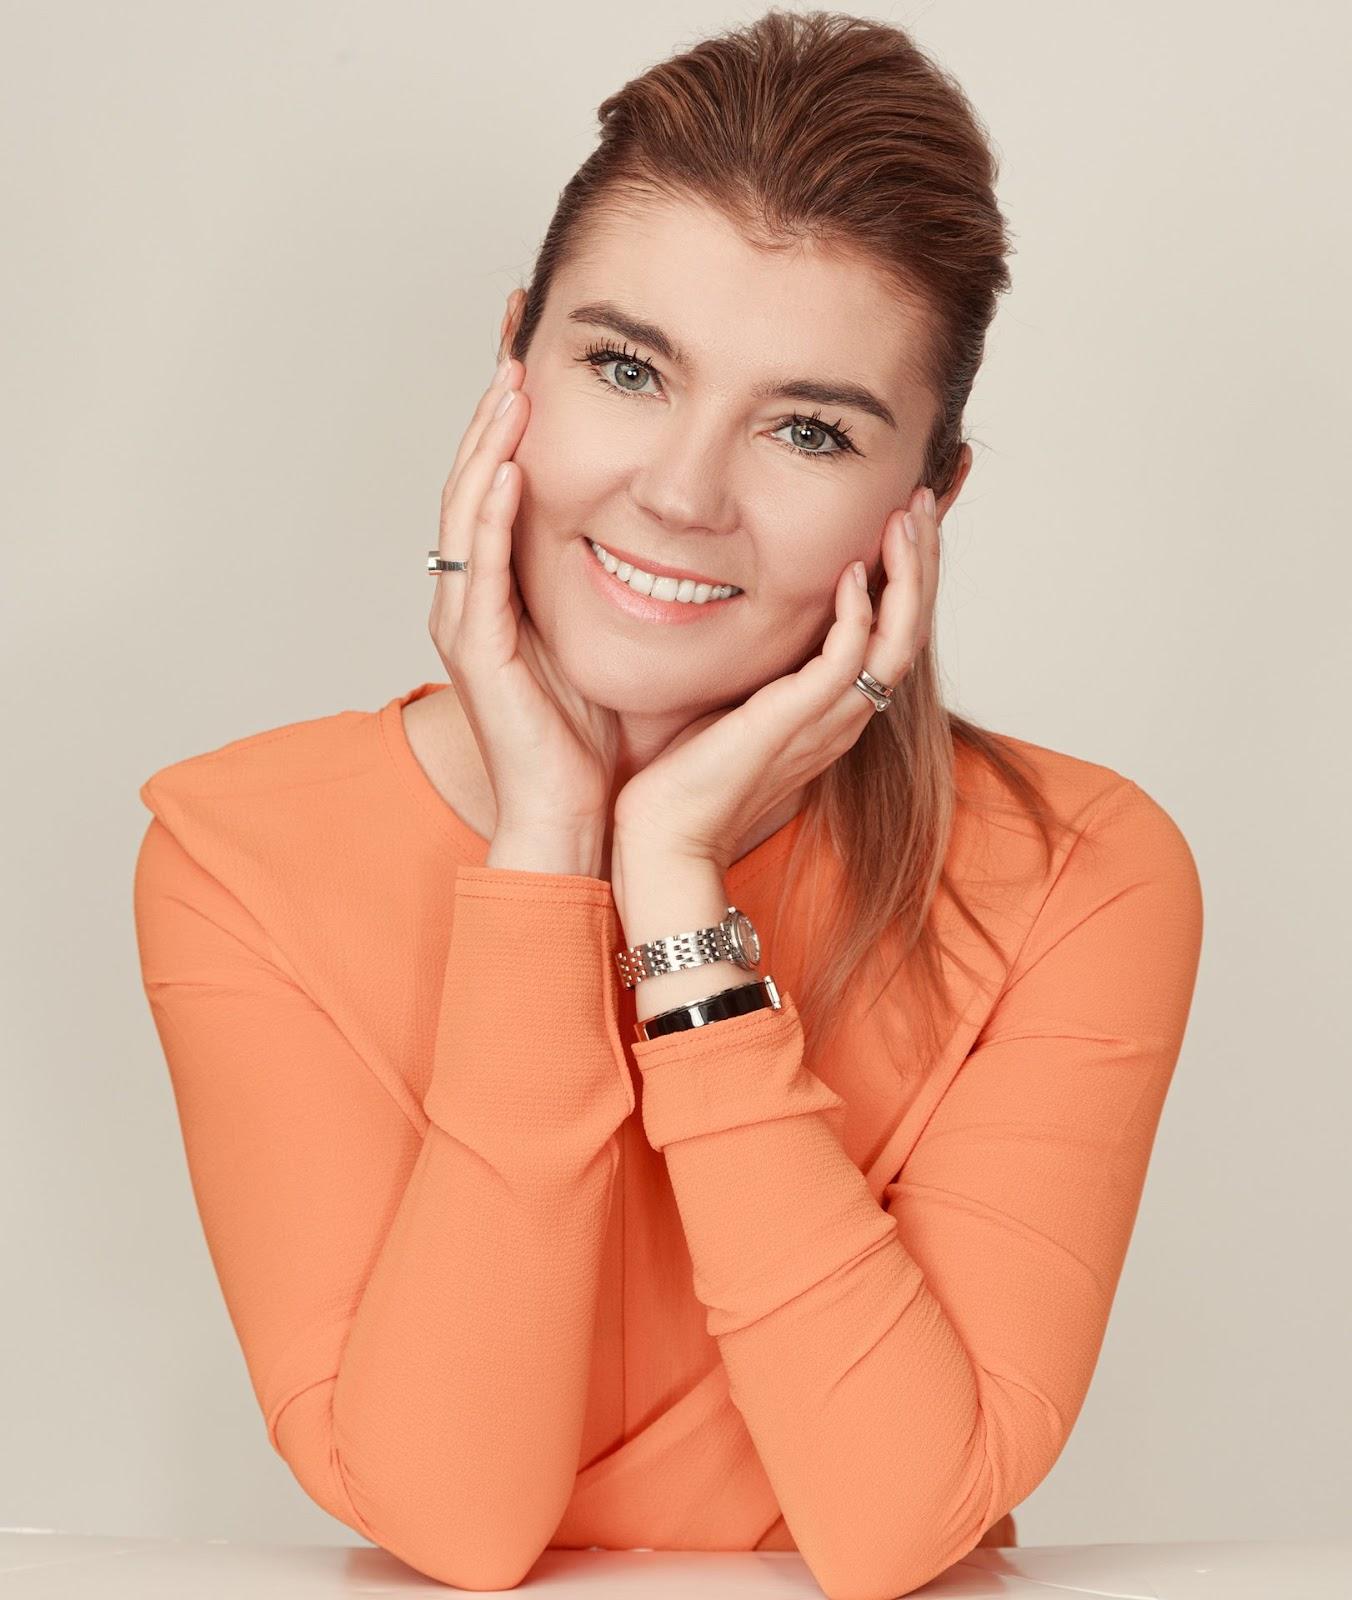 Zakladatelka e-shopu s britskou módou Lenka O'Neill